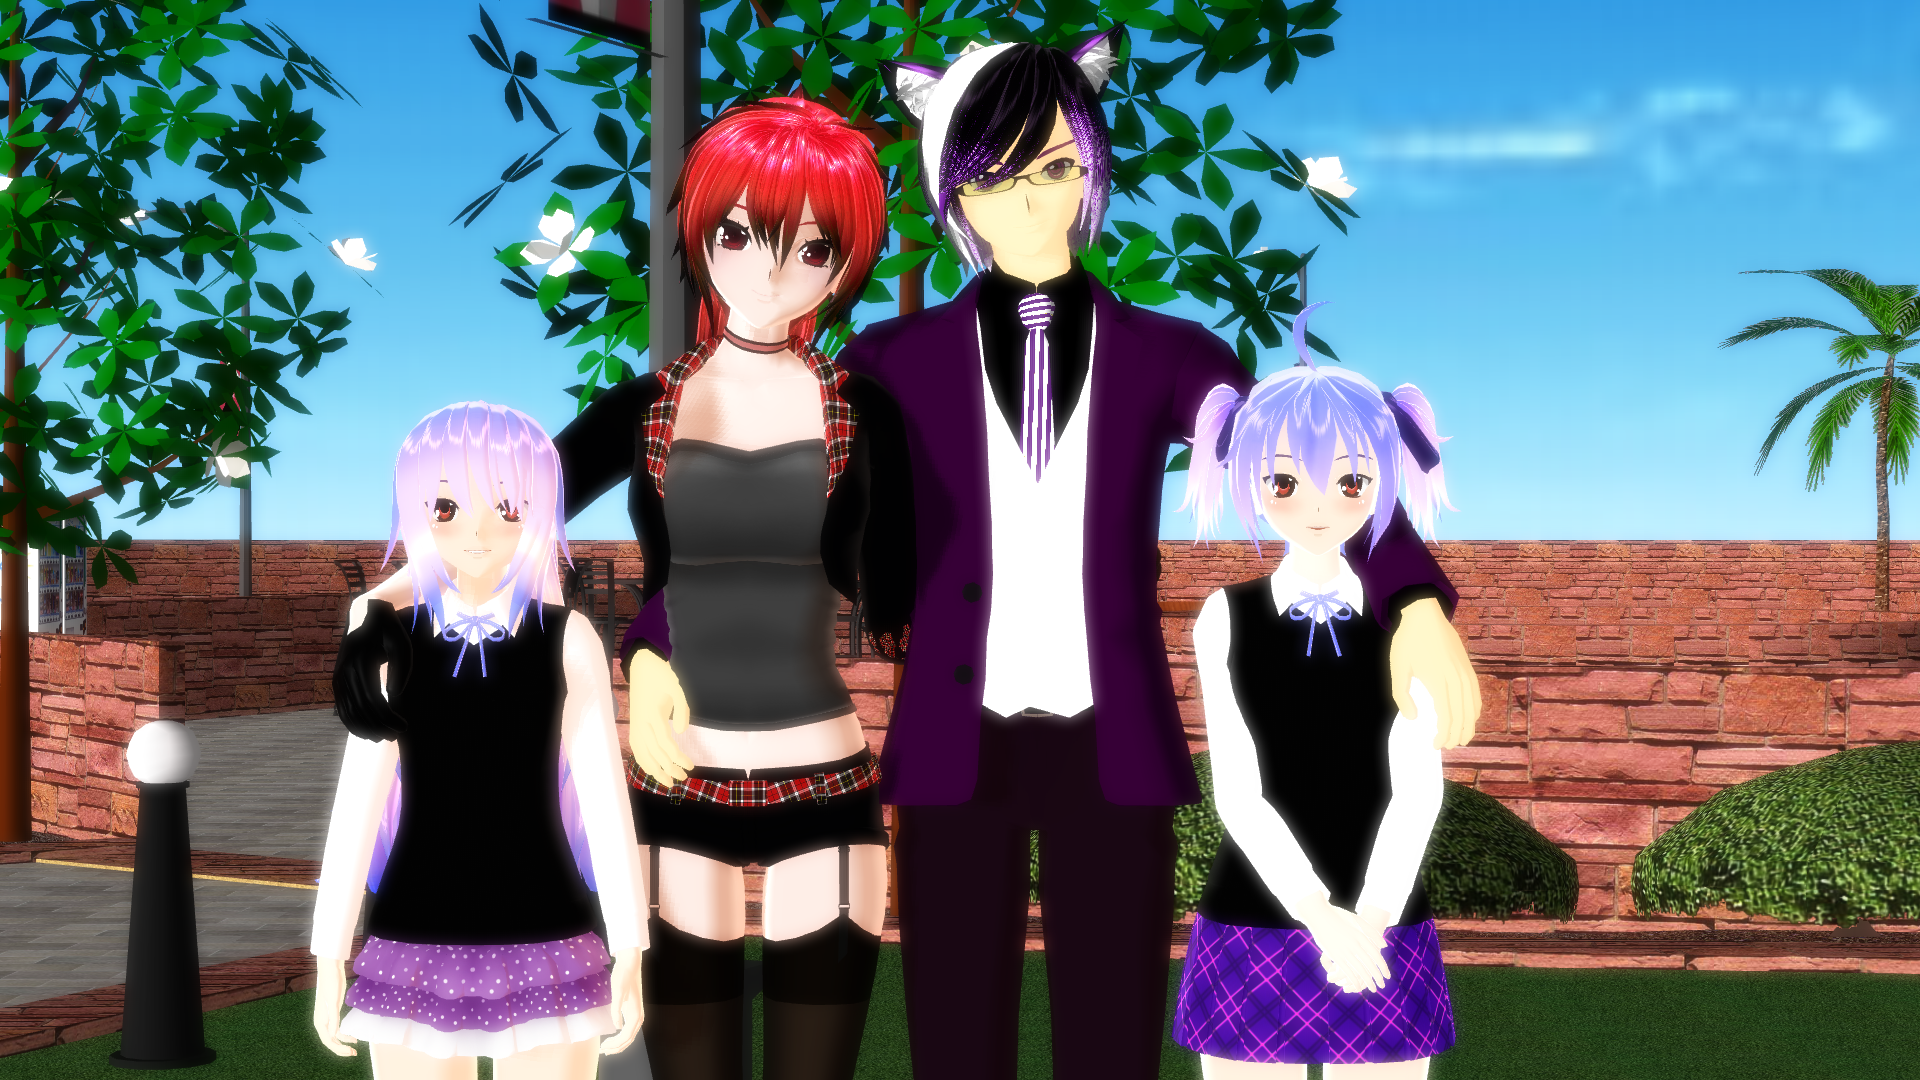 Family photo by Galatea-san